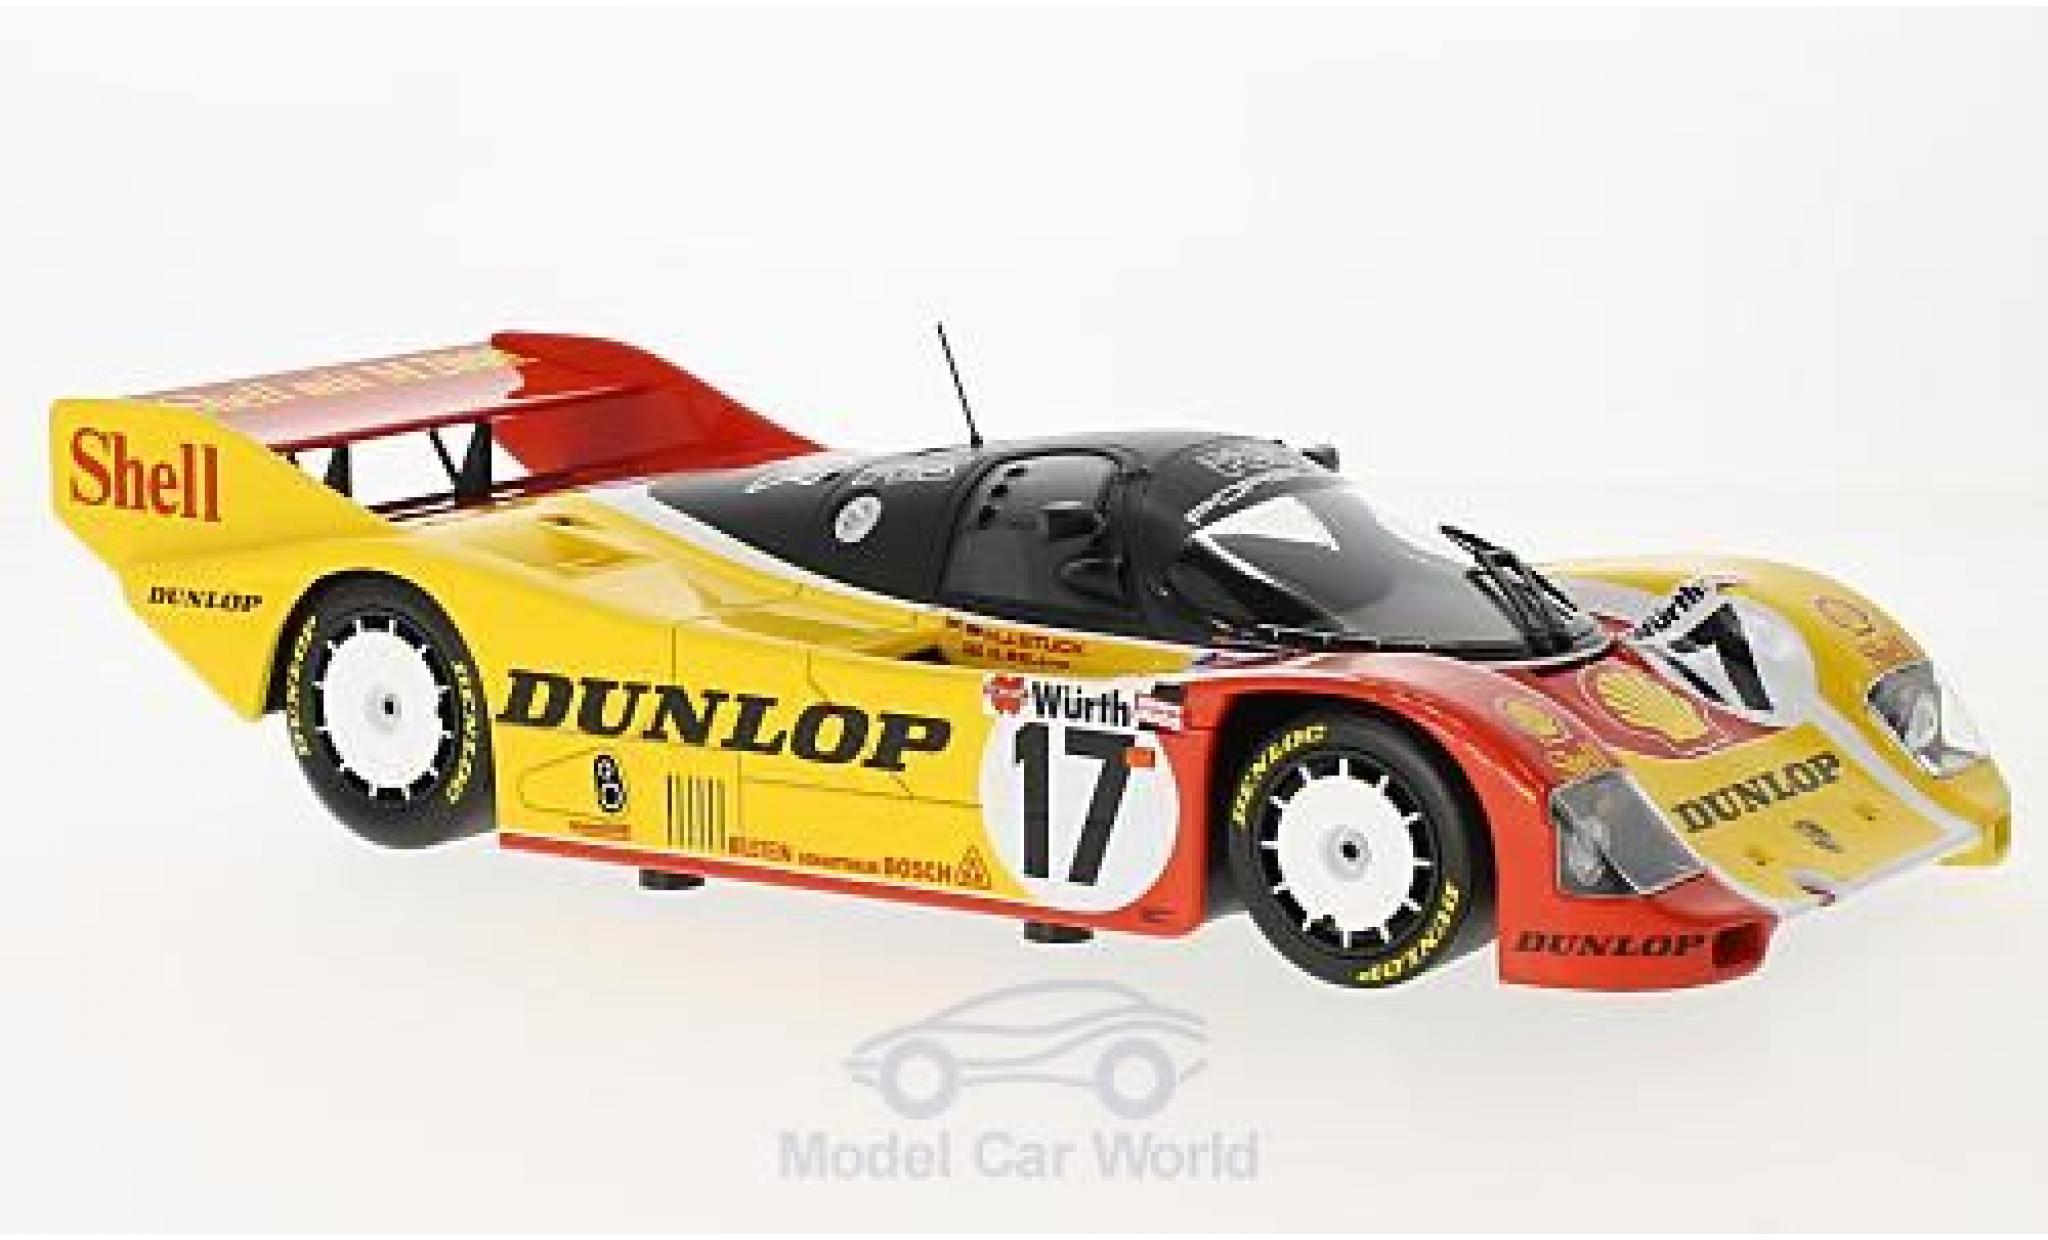 1987 Porsche 962 C 962c Brun 1000 km nurburgring mass Larrauri 1:18 Minichamps